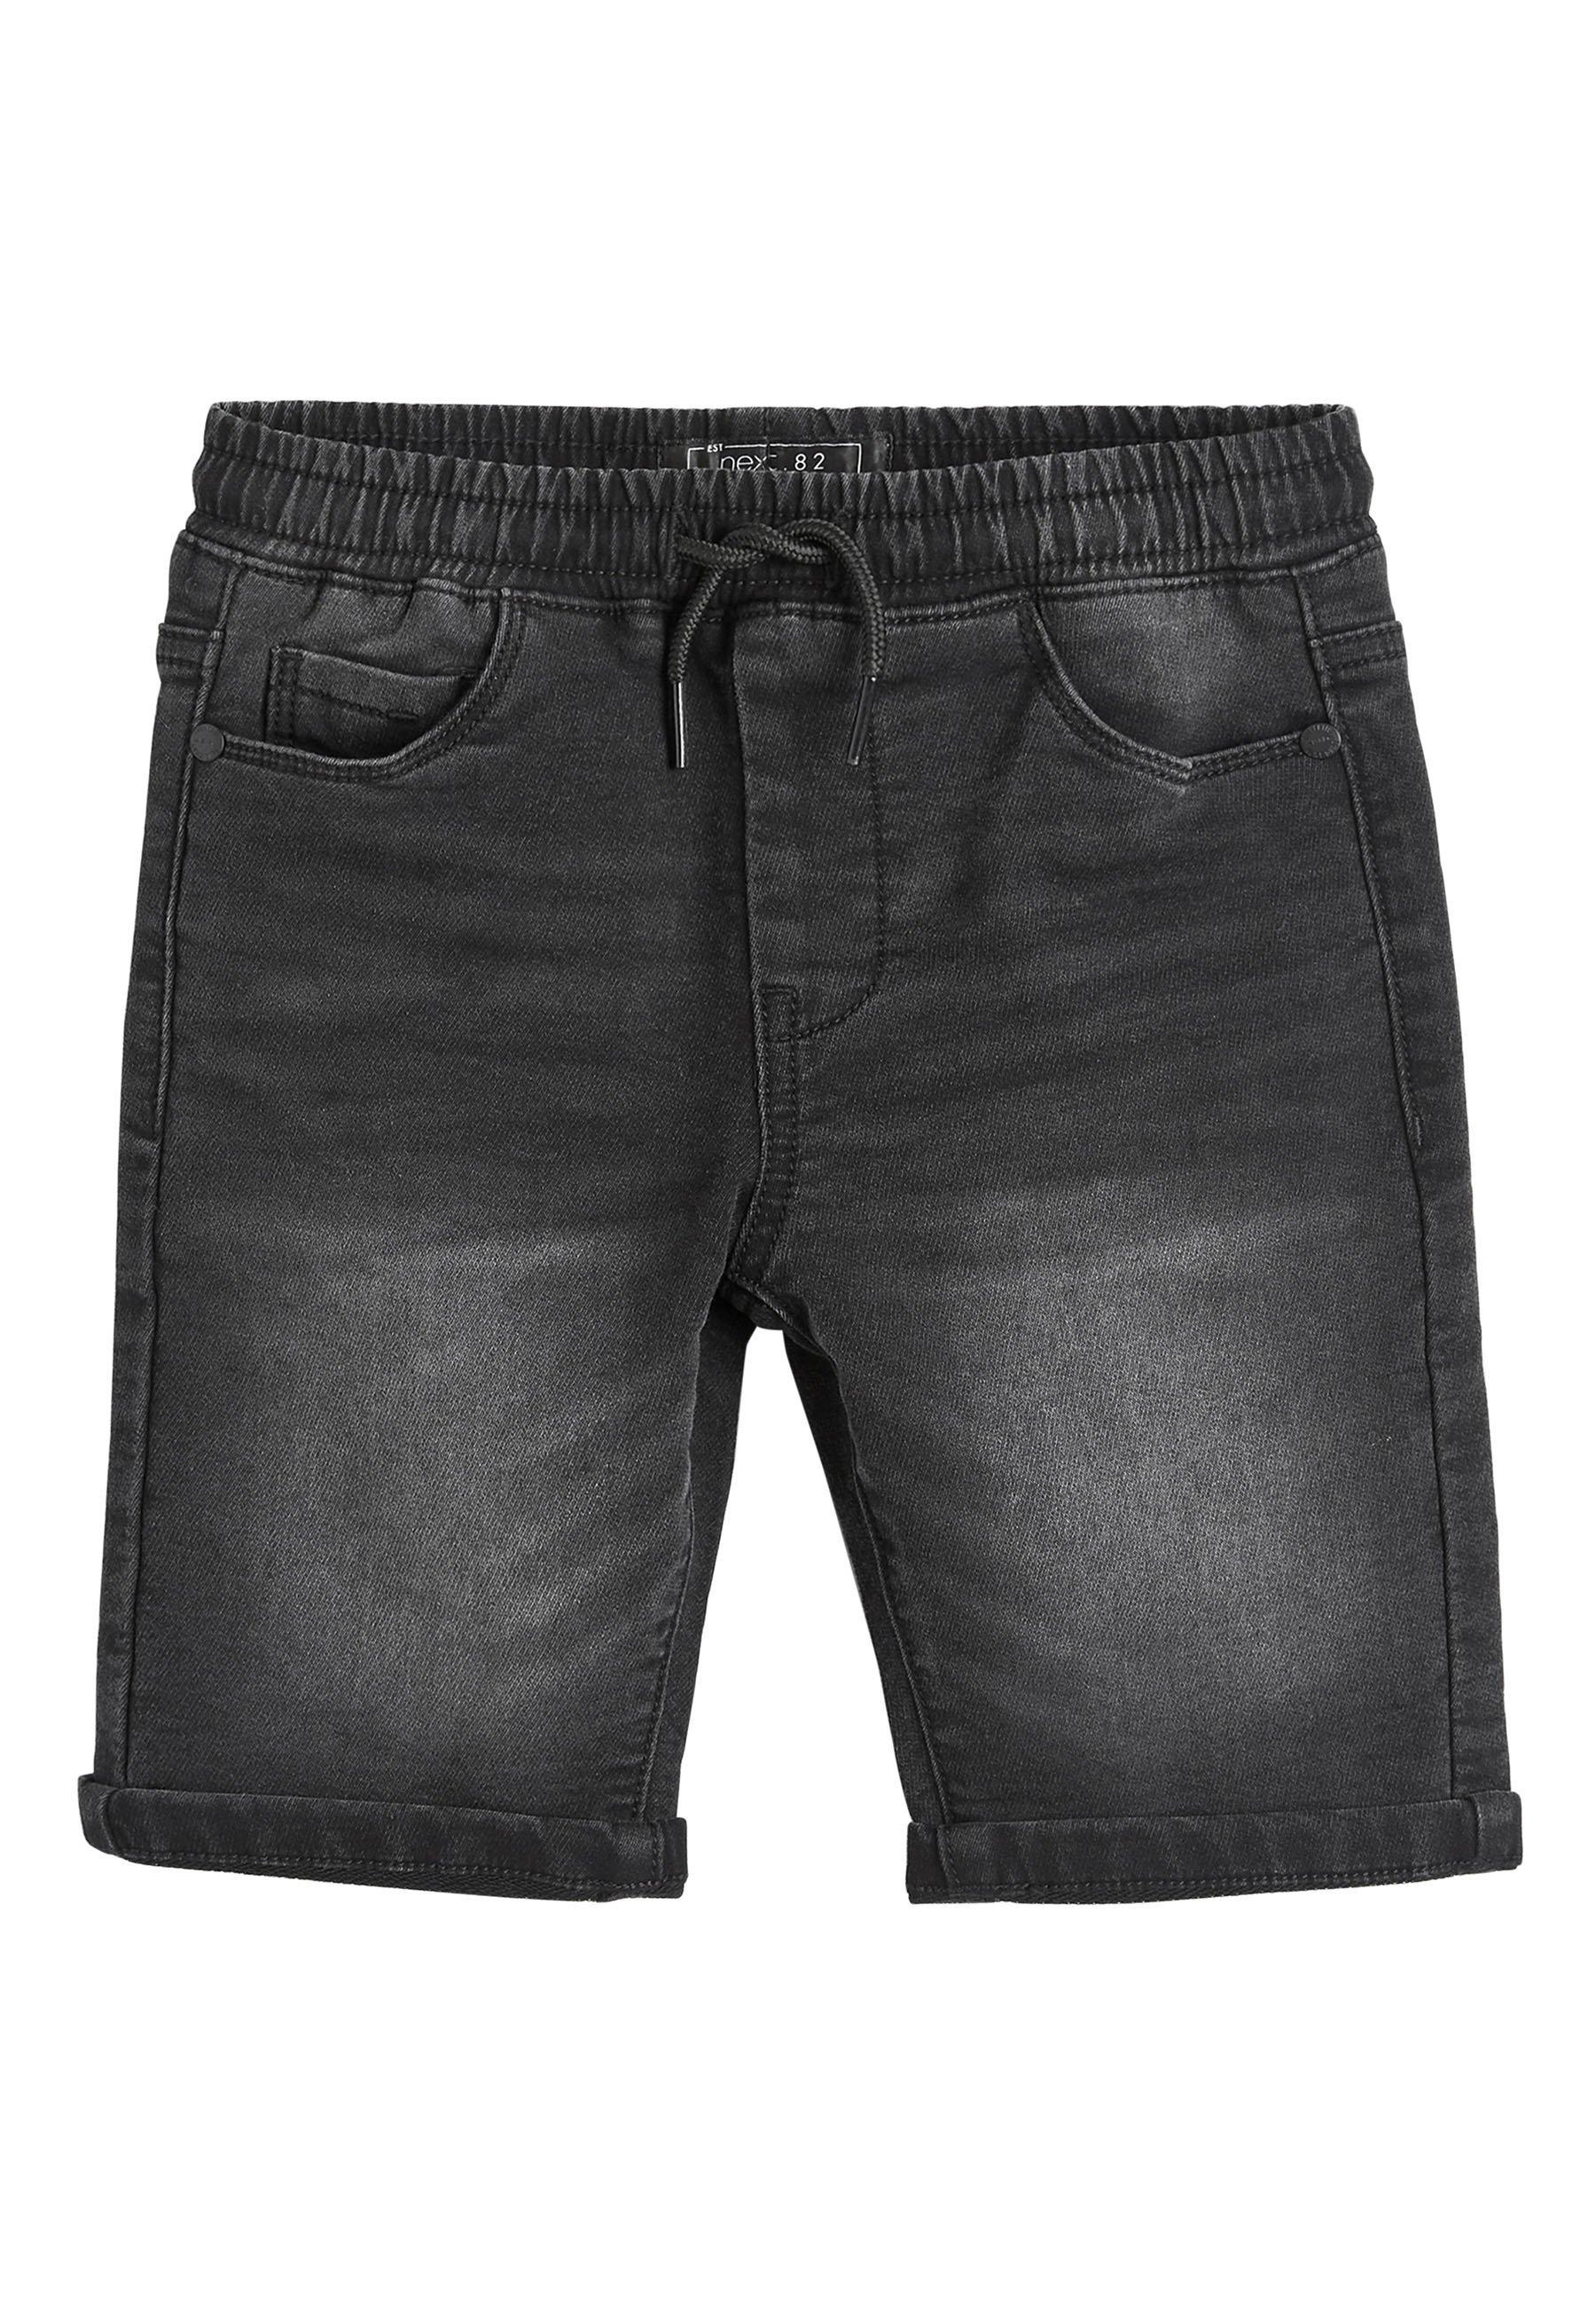 Kinder BLACK JERSEY JEAN SHORTS (3-16YRS) - Jeans Shorts